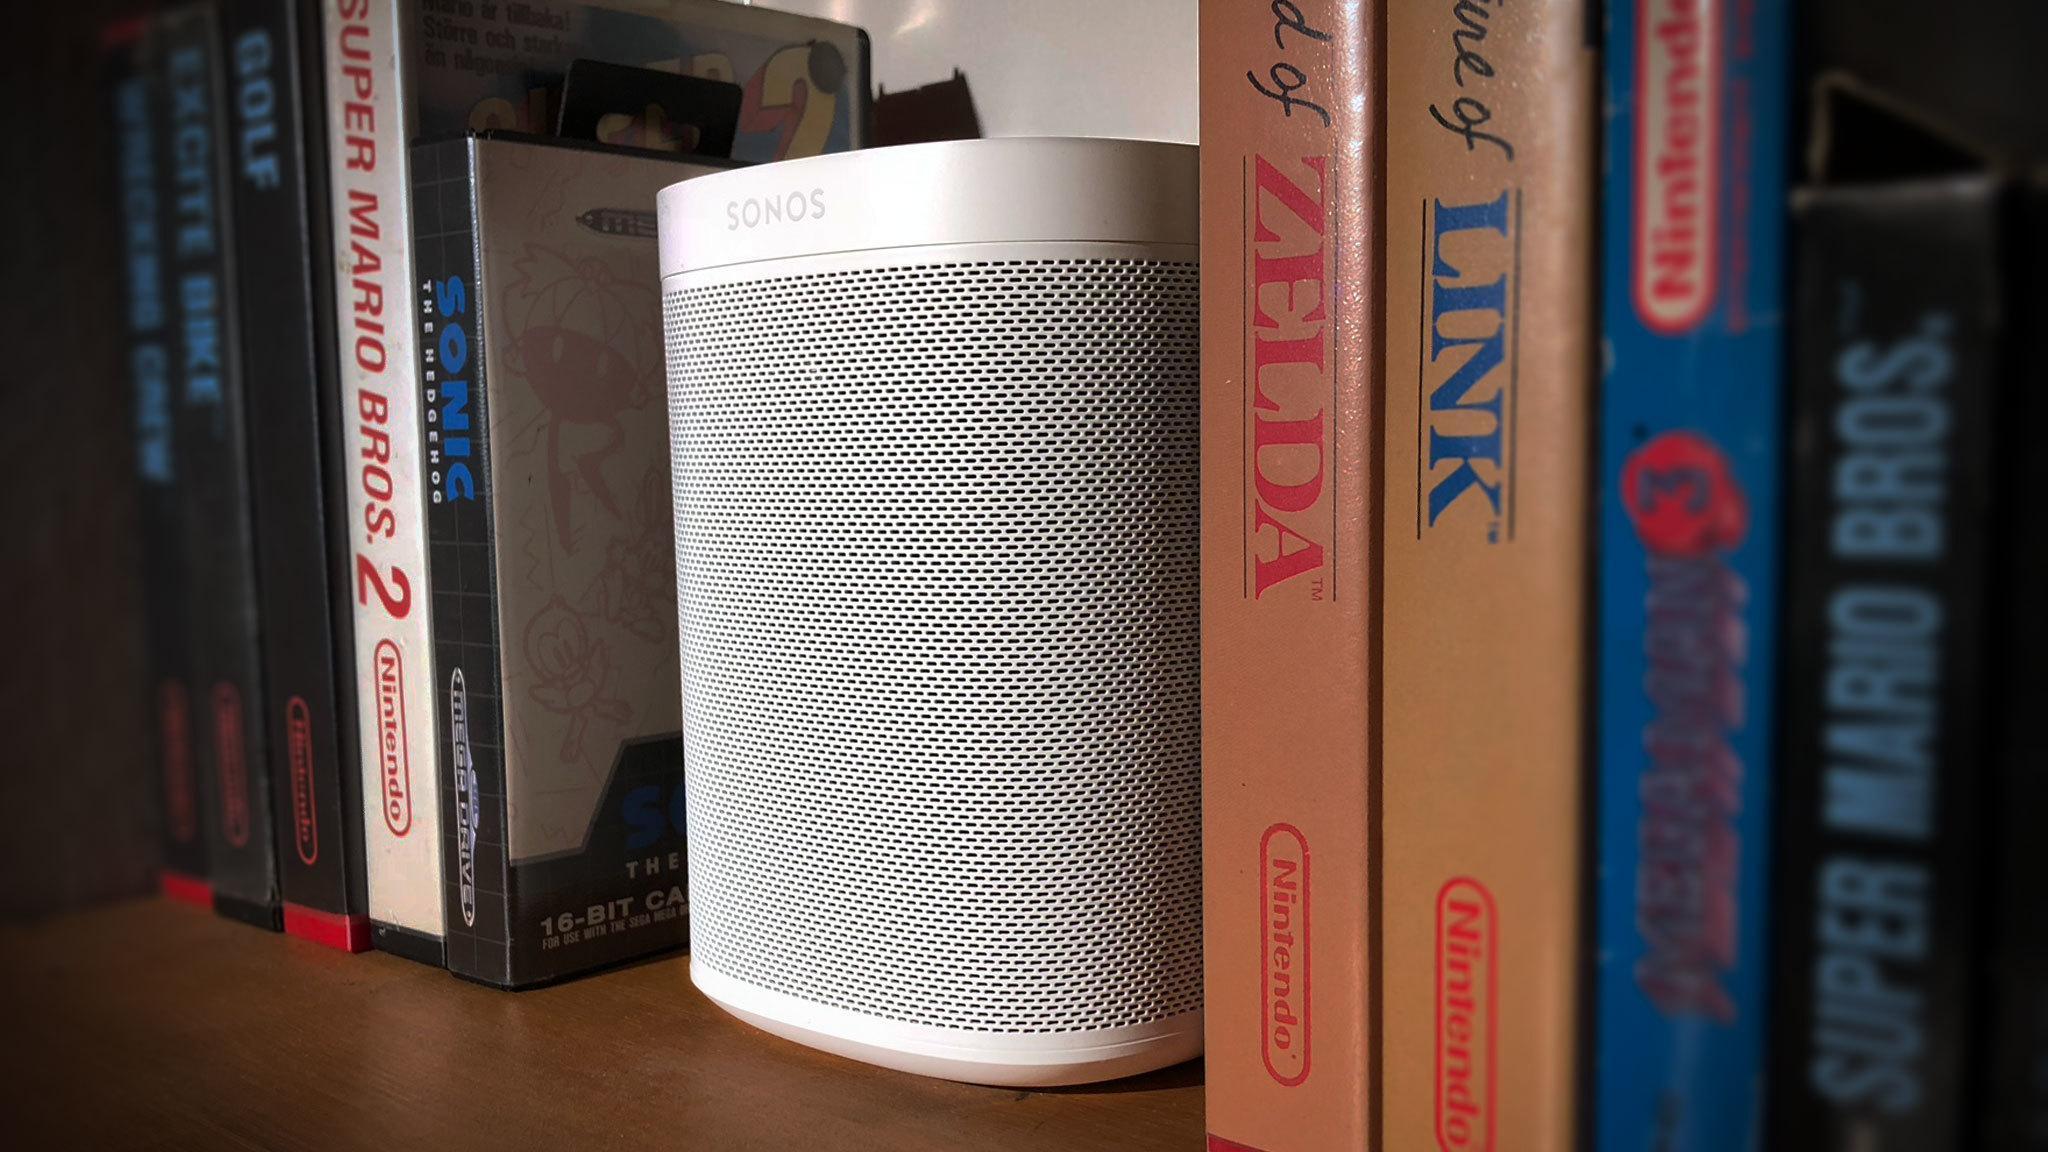 Sonos-høyttalerne får endelig Google Assistant